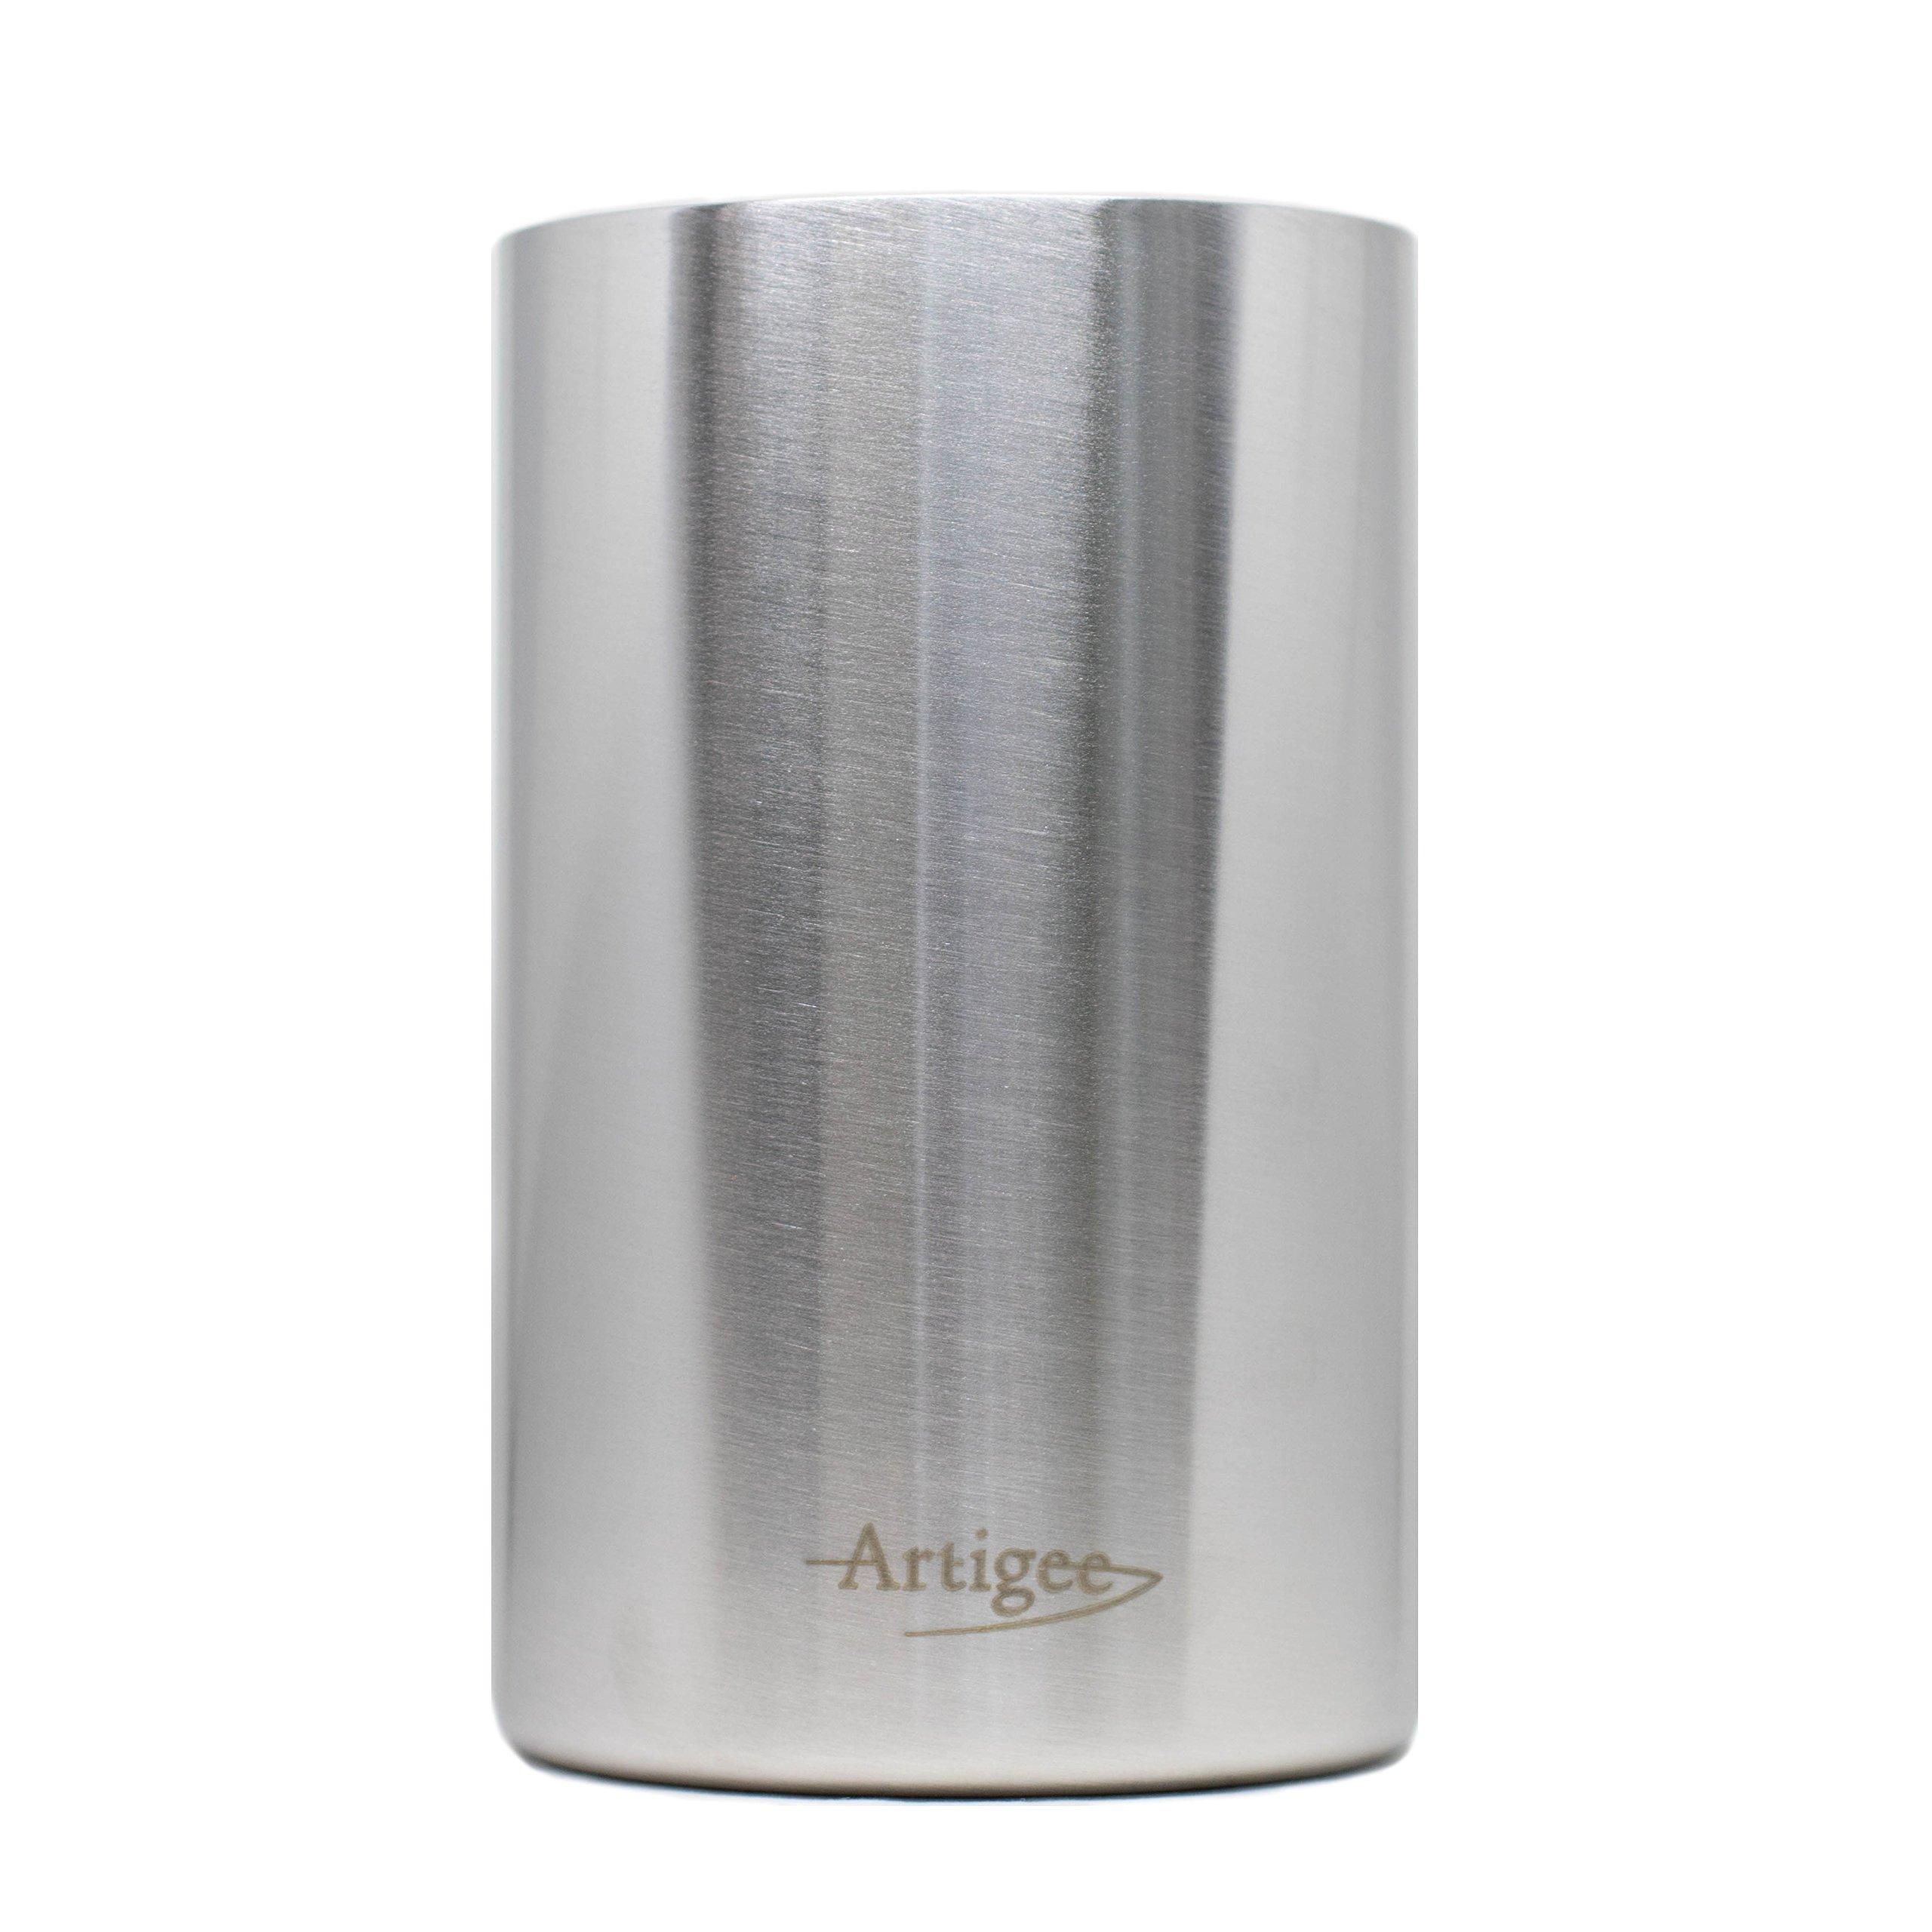 ARTIGEE Wine Cooler Bucket | Premium Grade 18/8 Stainless Steel Double Wall Wine Bottle Chiller